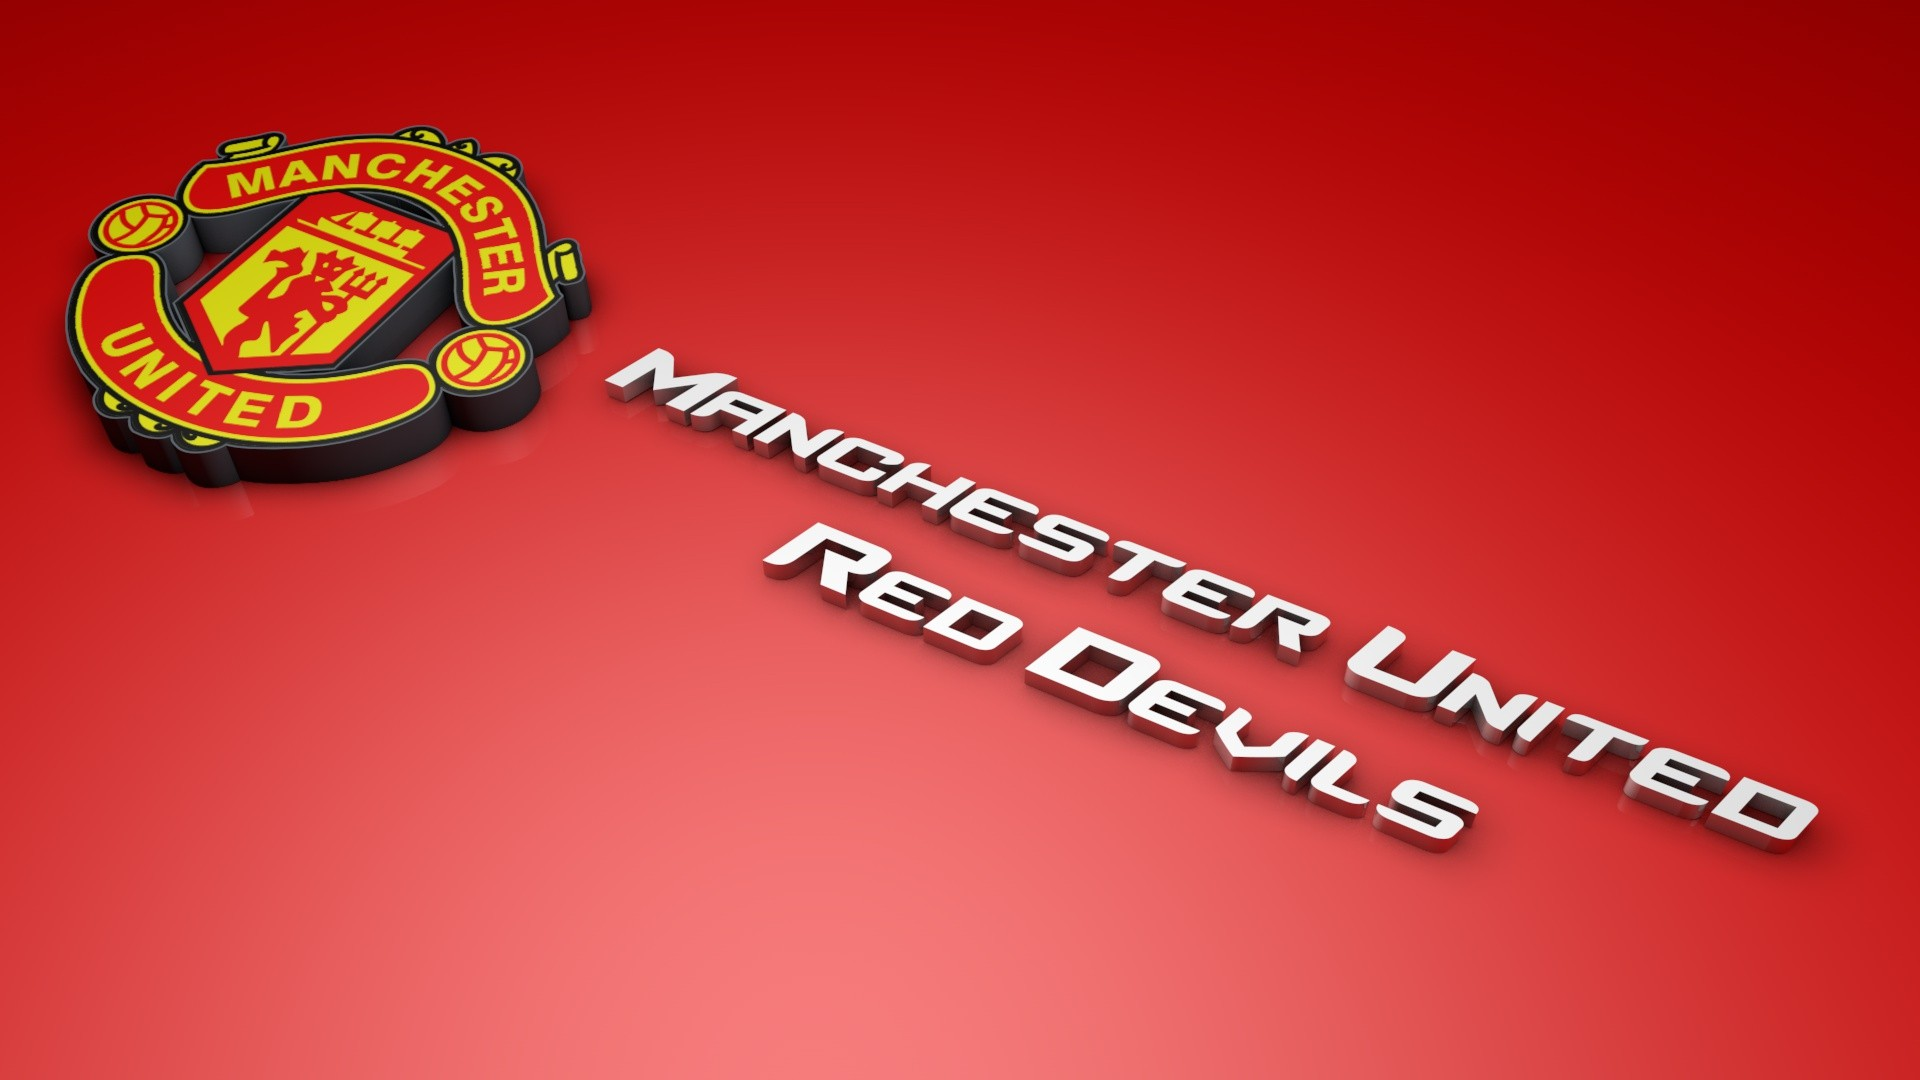 50 ] Manchester United Desktop Wallpaper On WallpaperSafari